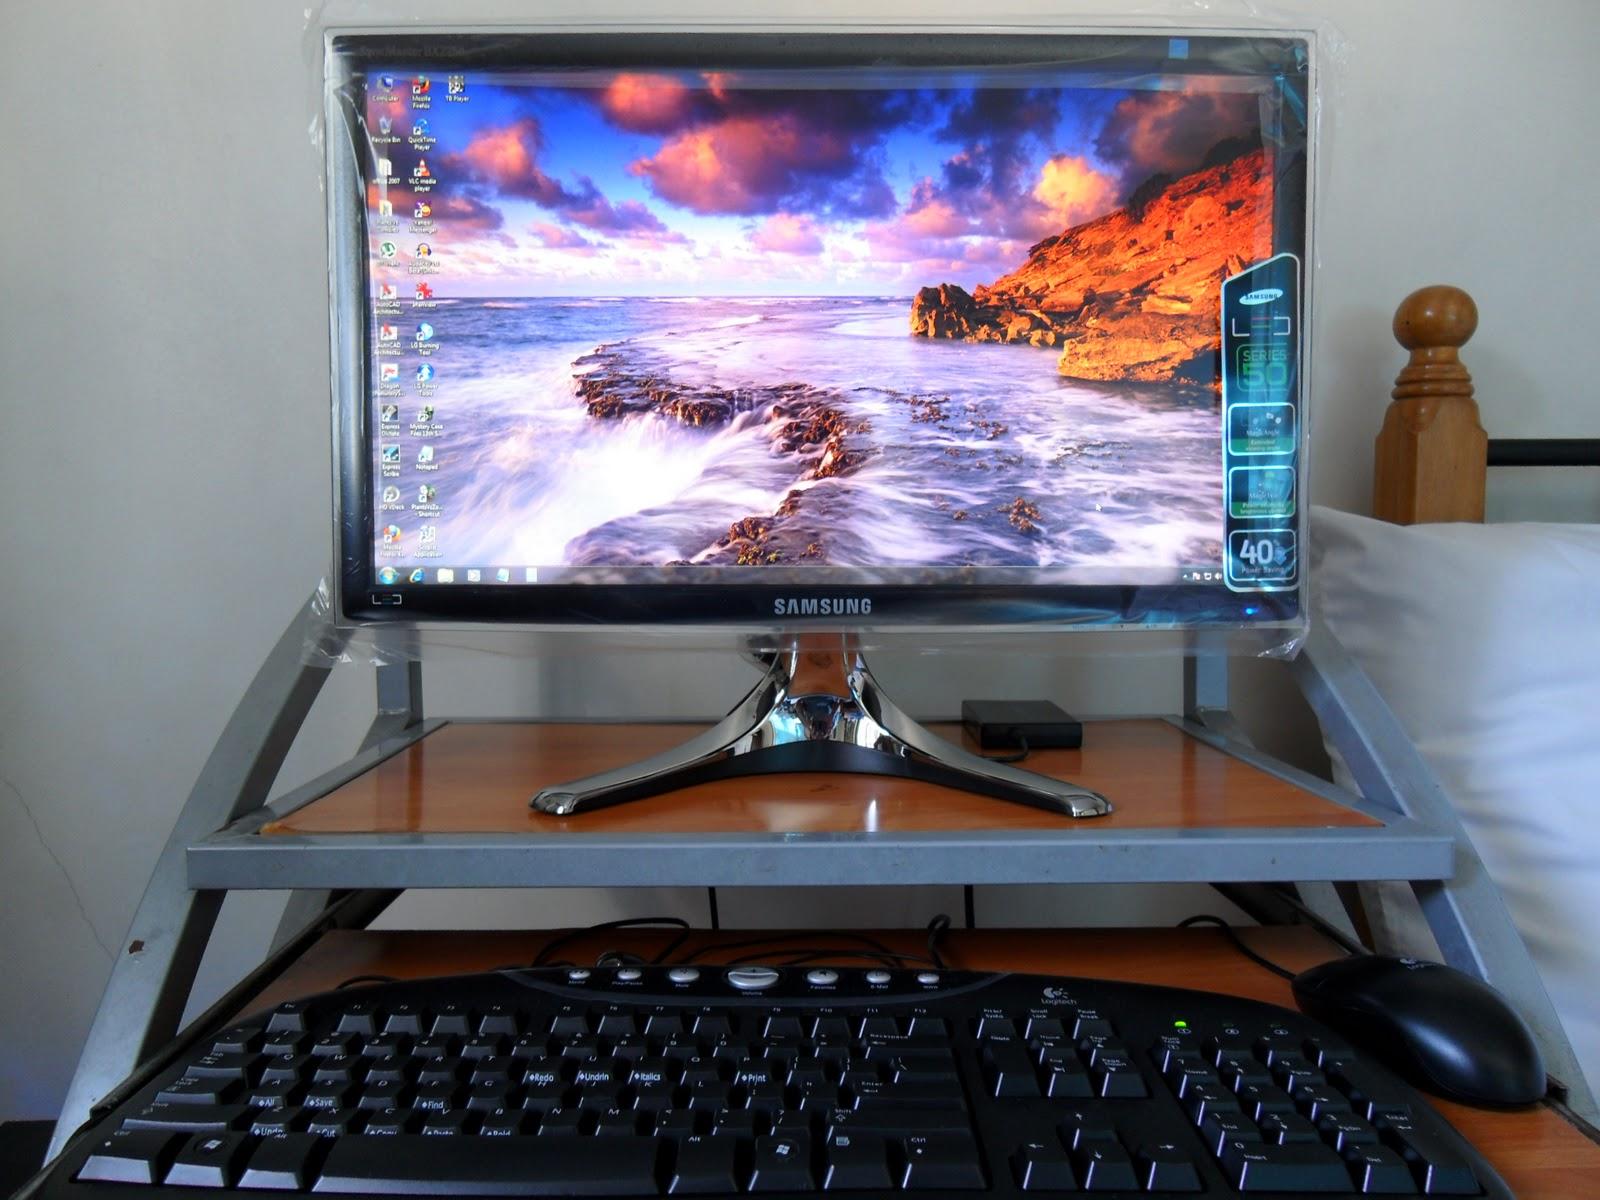 Samsung Led Monitor 24 Wallpaper 1600x1200